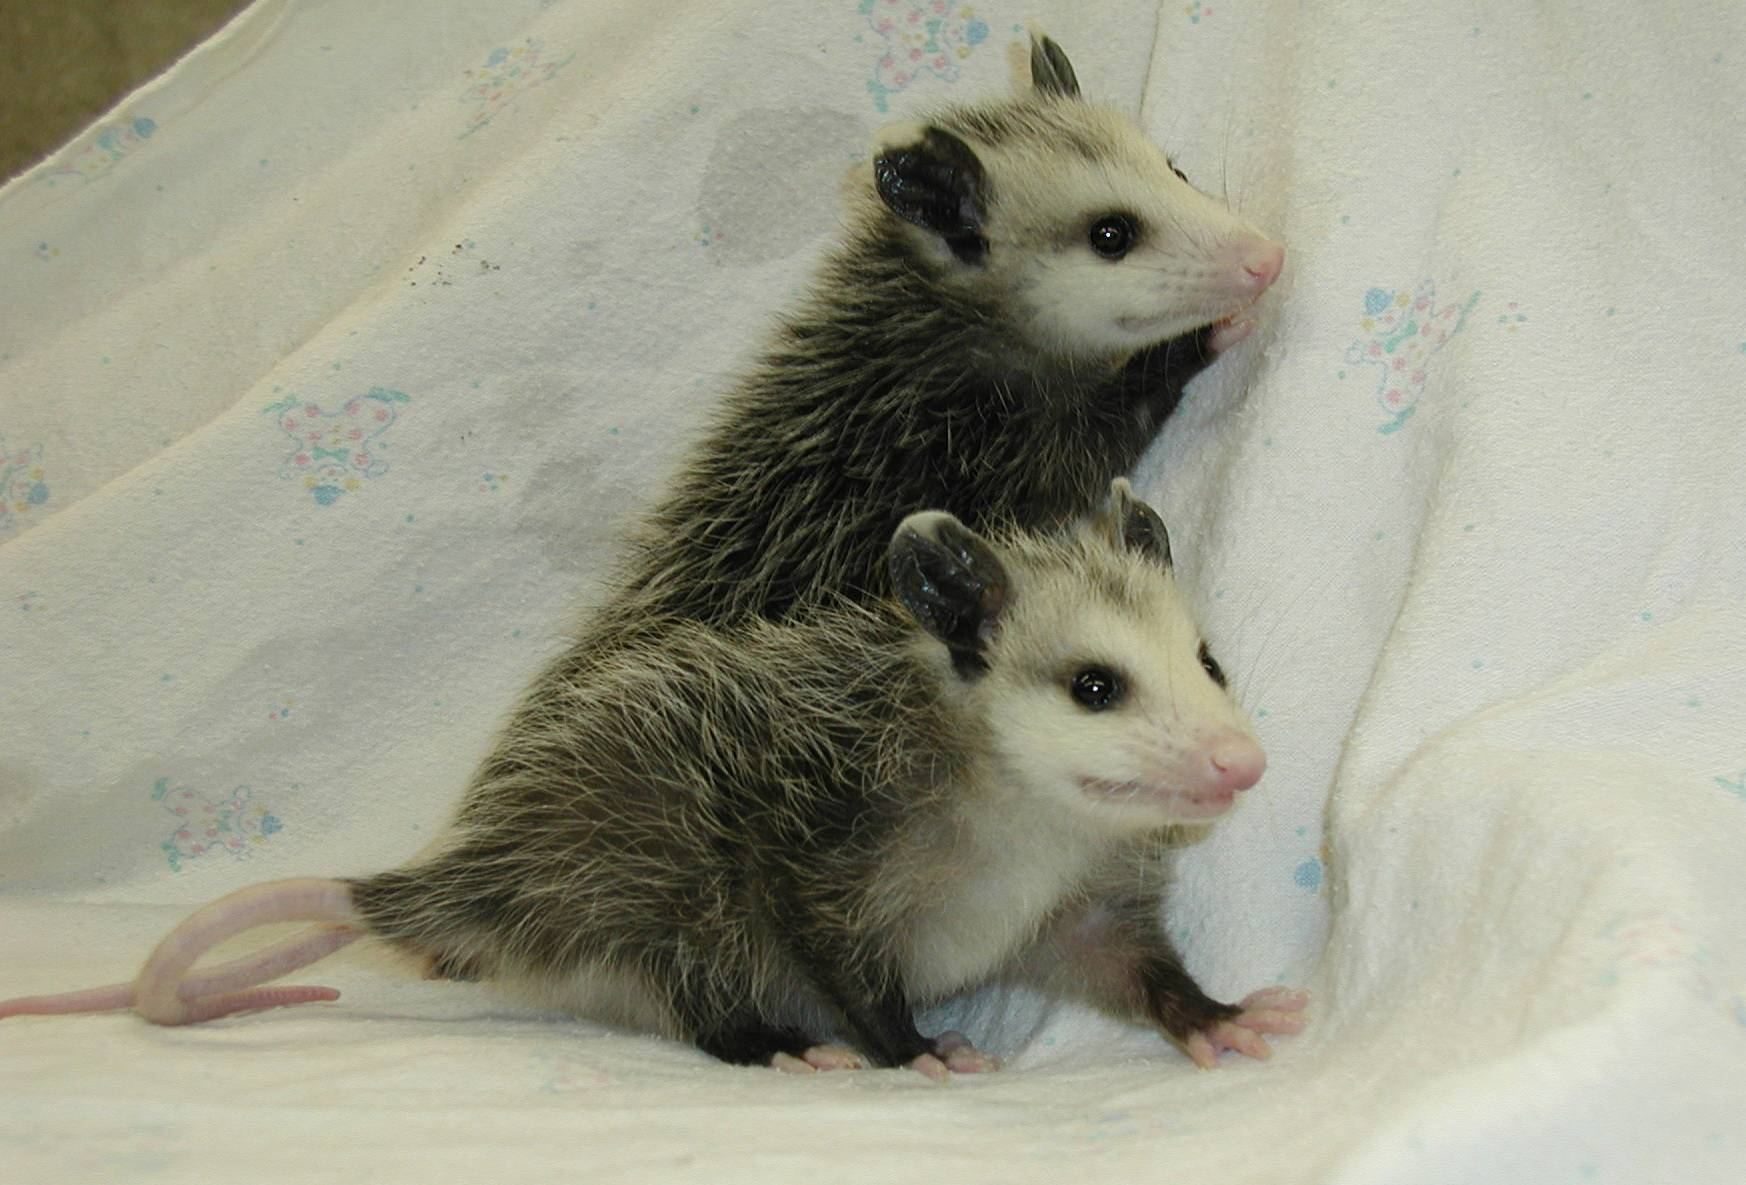 Young Virginia Opossums